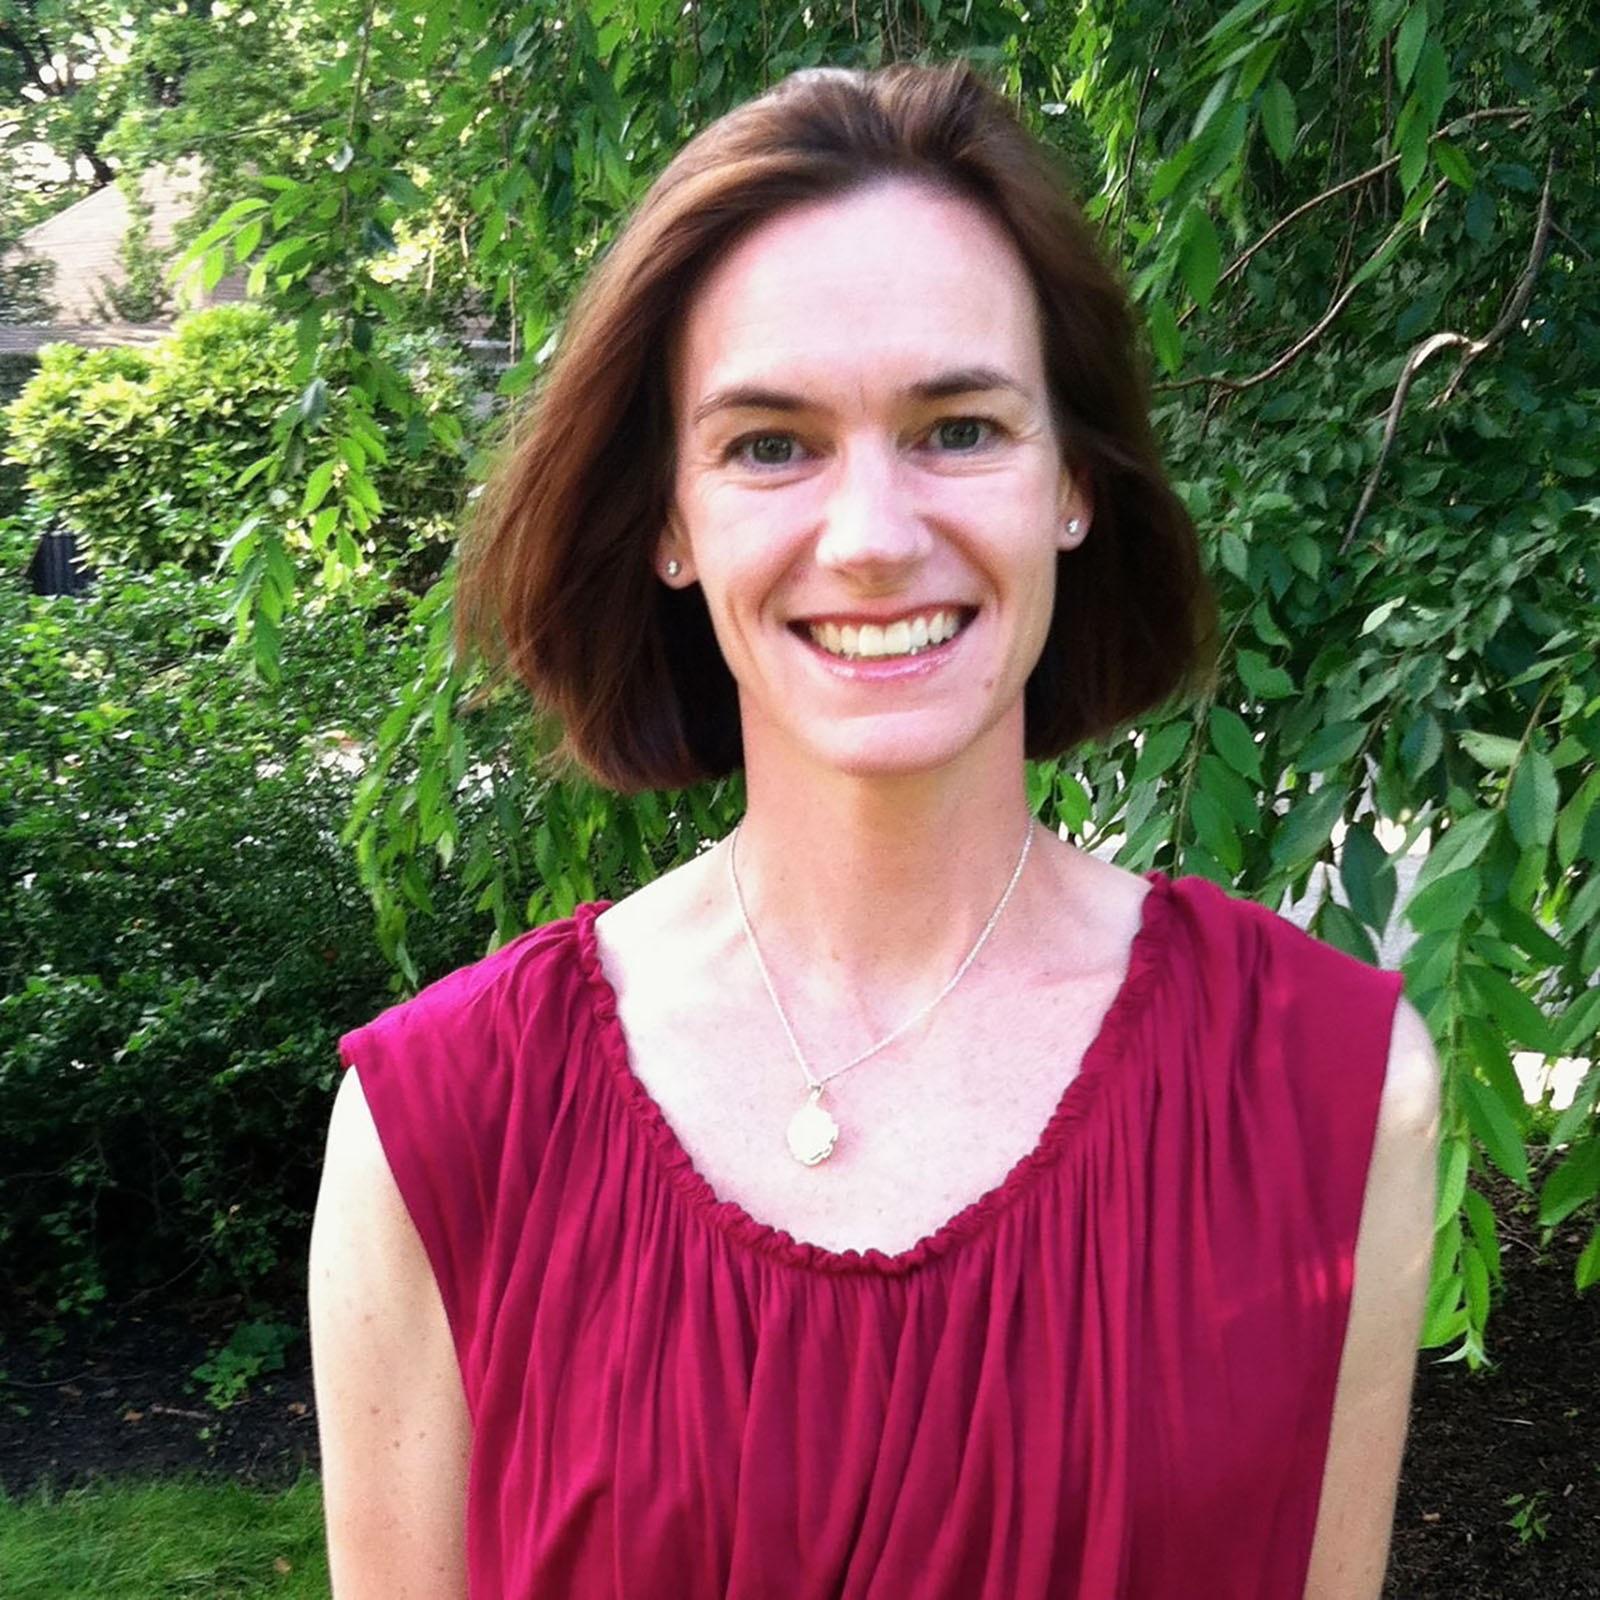 Courtenay Harris Bond is a freelance journalist.